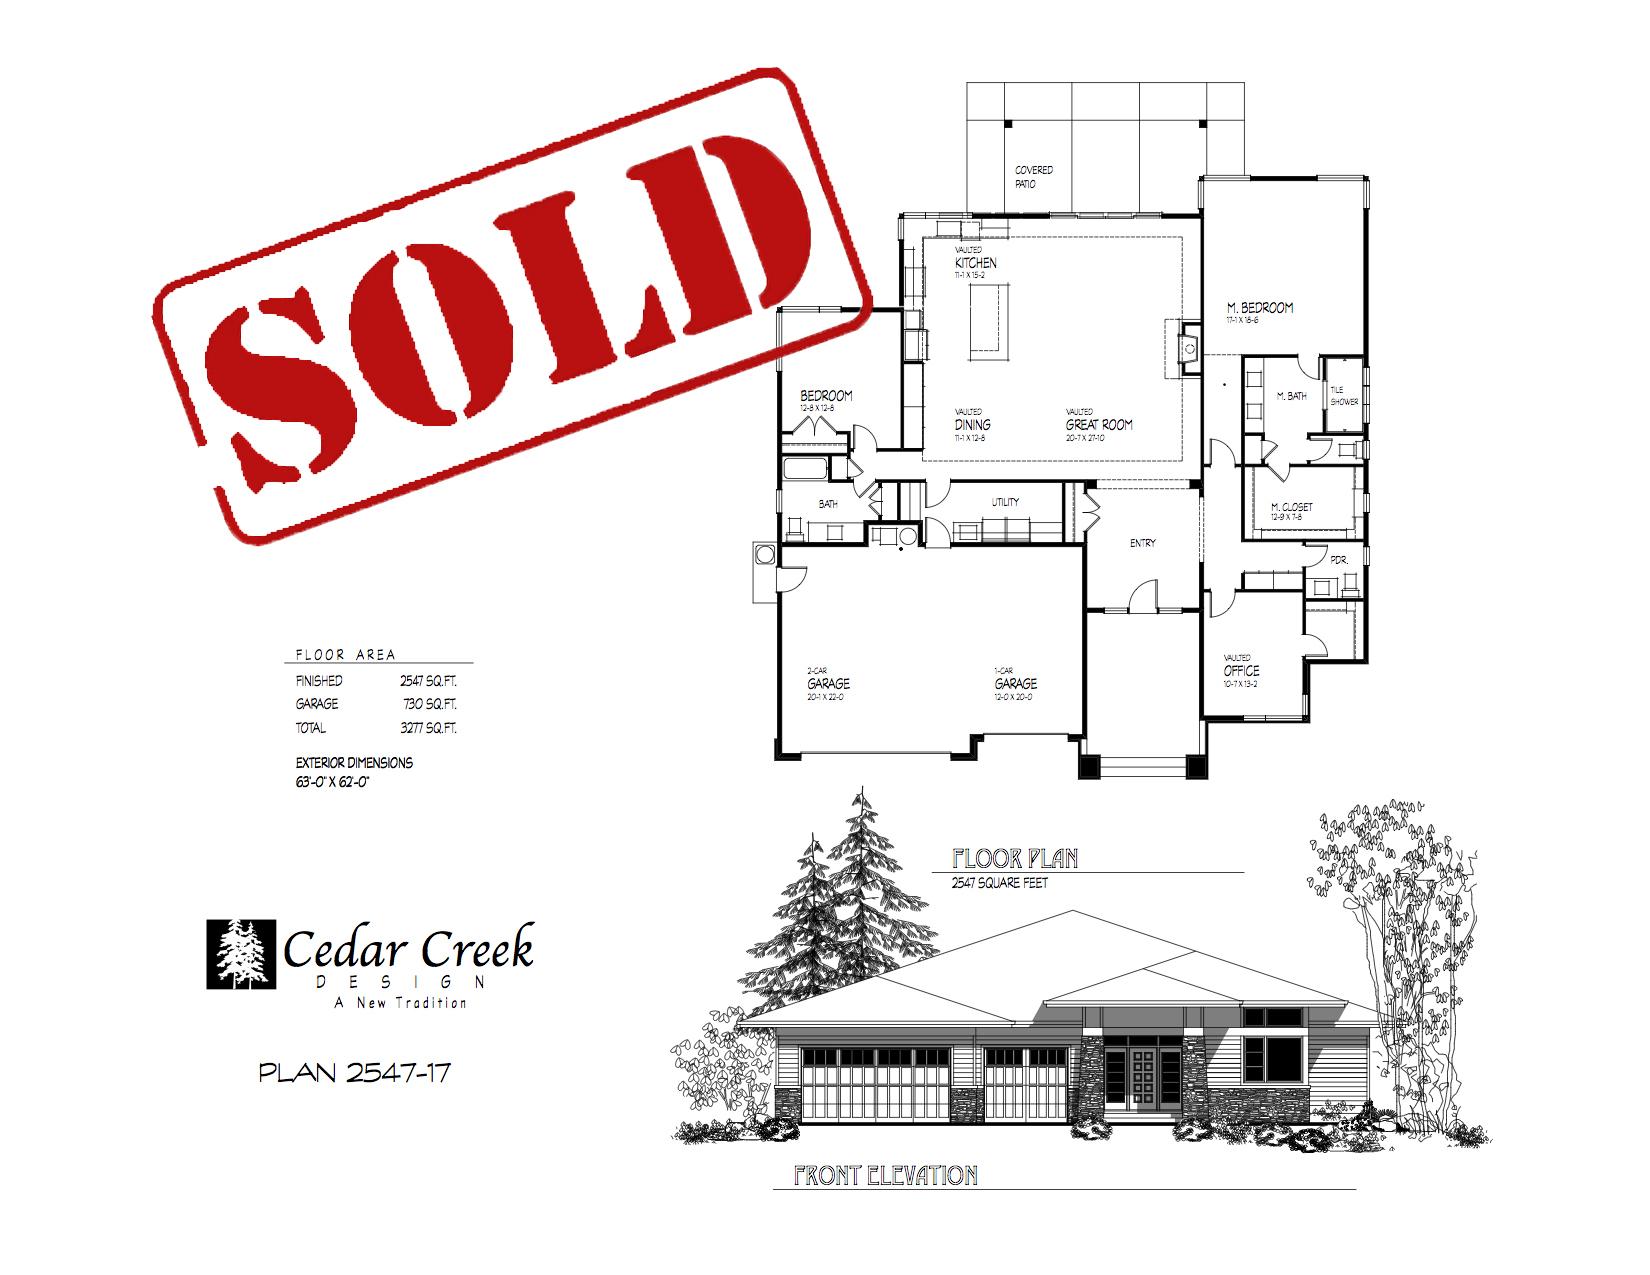 Lot 32 - Sold.jpg